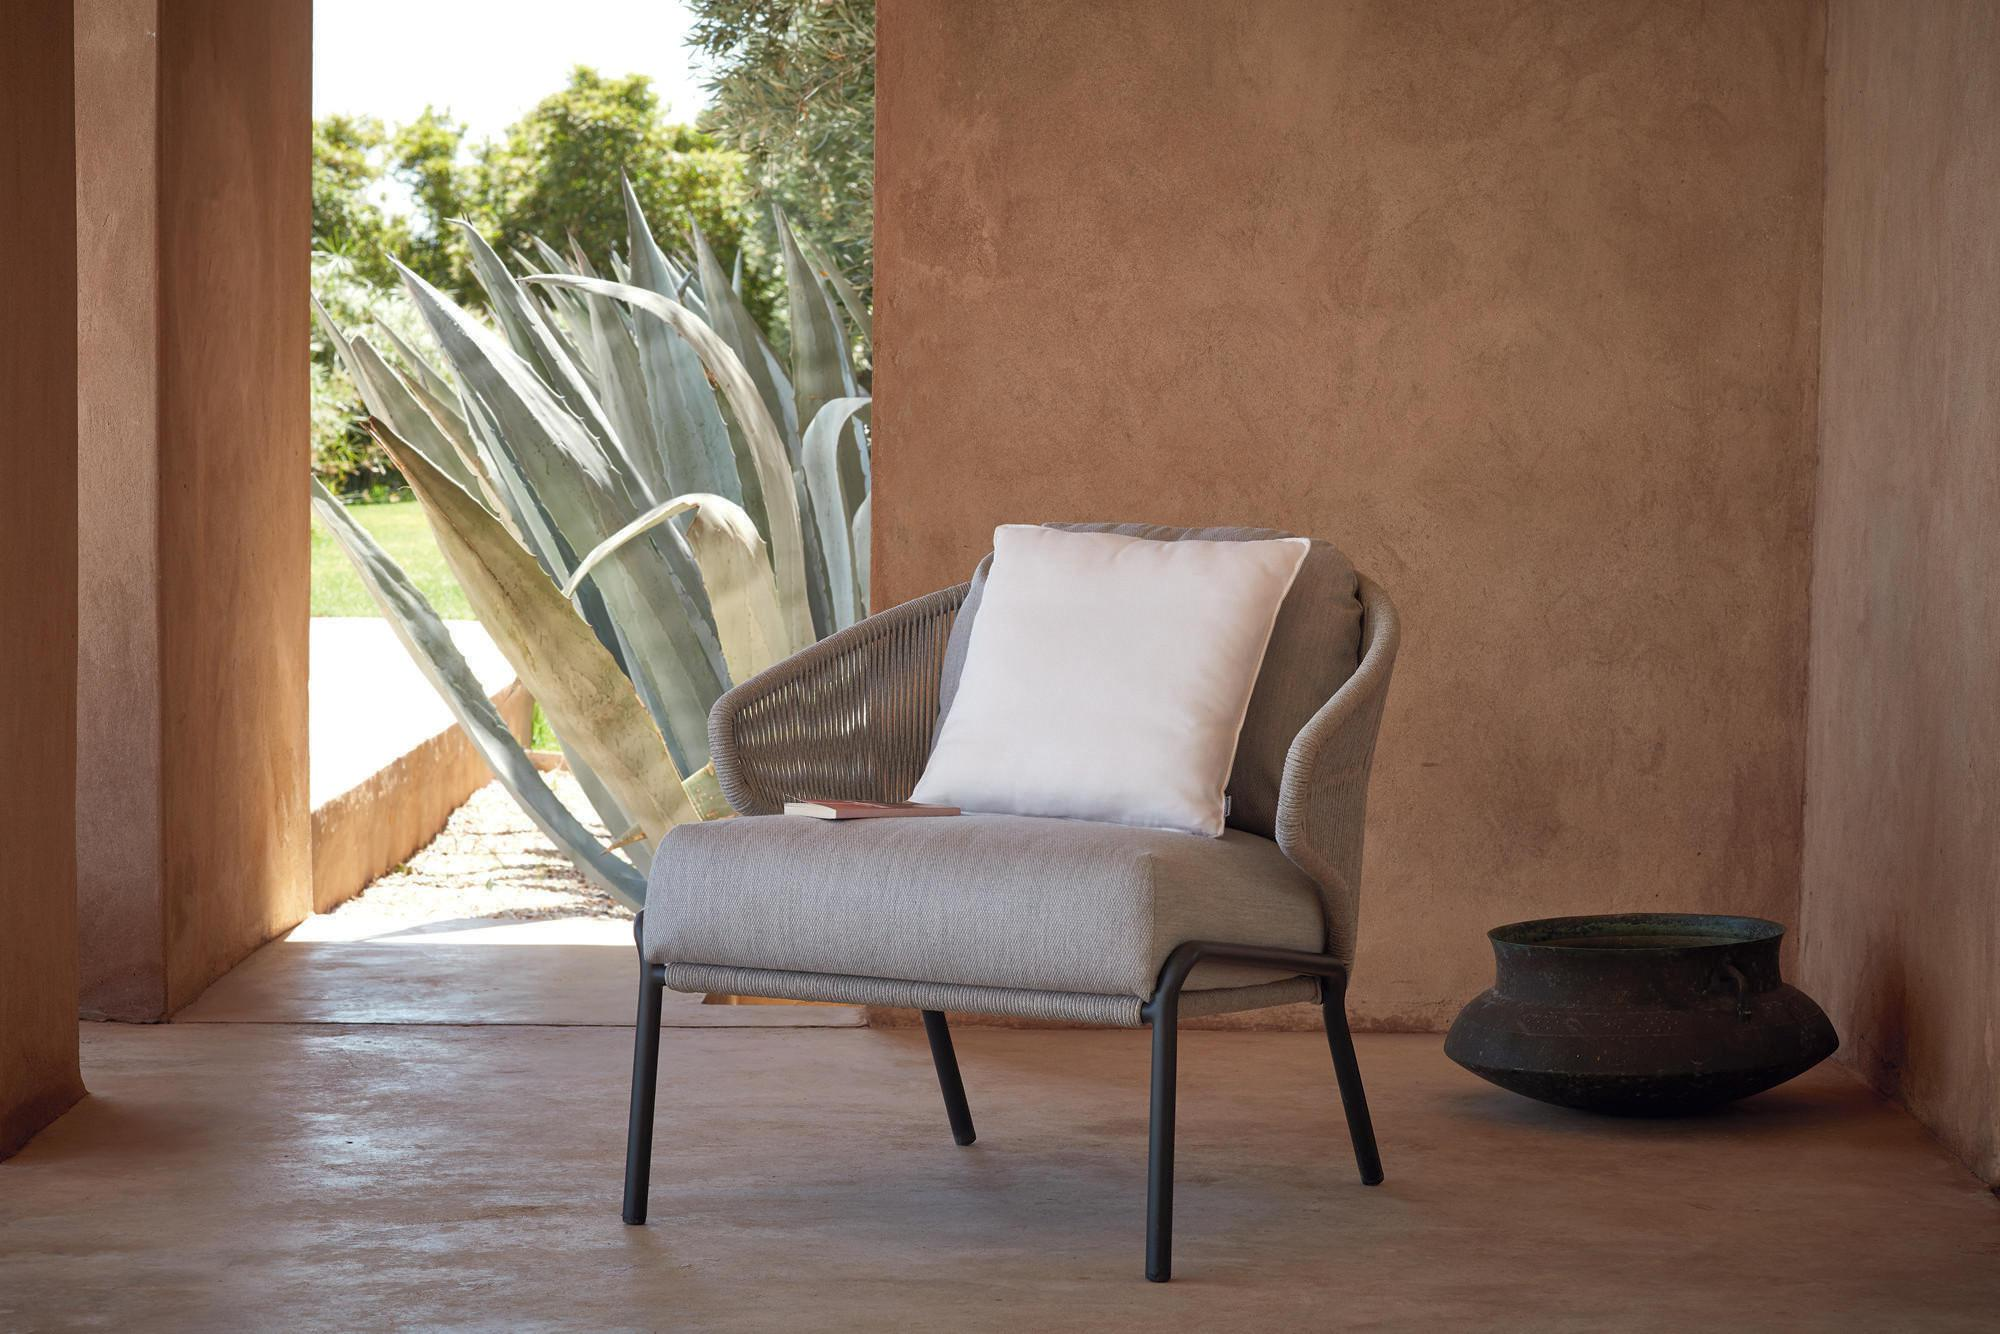 Radius Lounge-Sessel im kleinen Innenhof